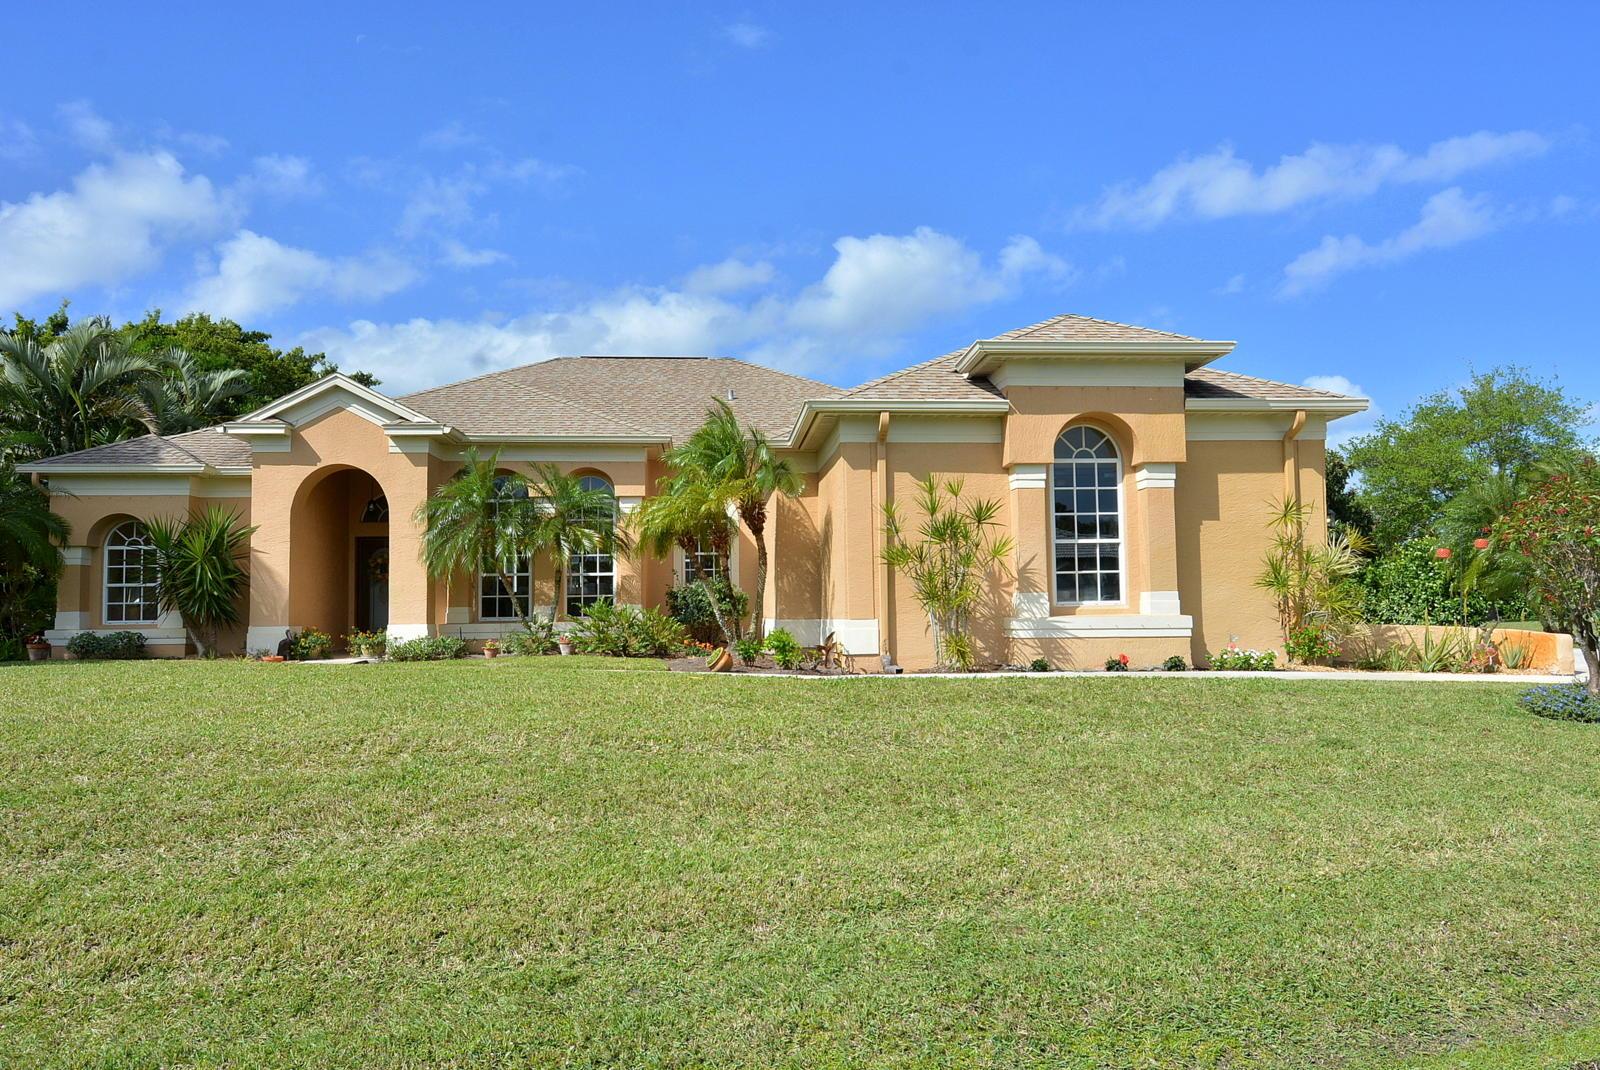 2598 SE Hamden Road 34952 - One of Port Saint Lucie Homes for Sale